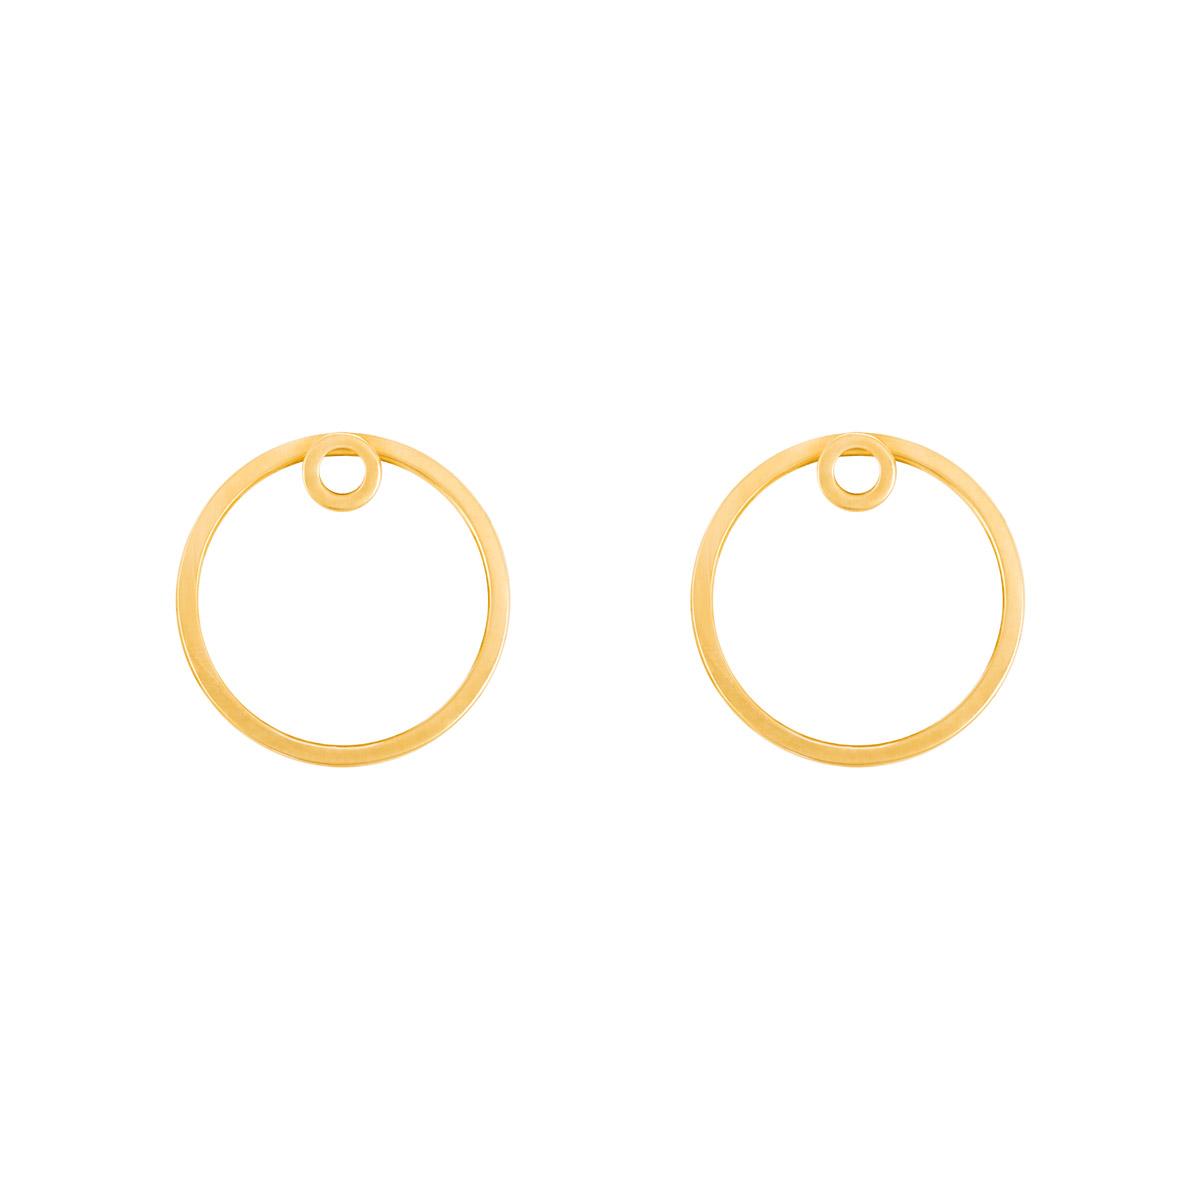 گوشواره طلا دایره توخالی بزرگ